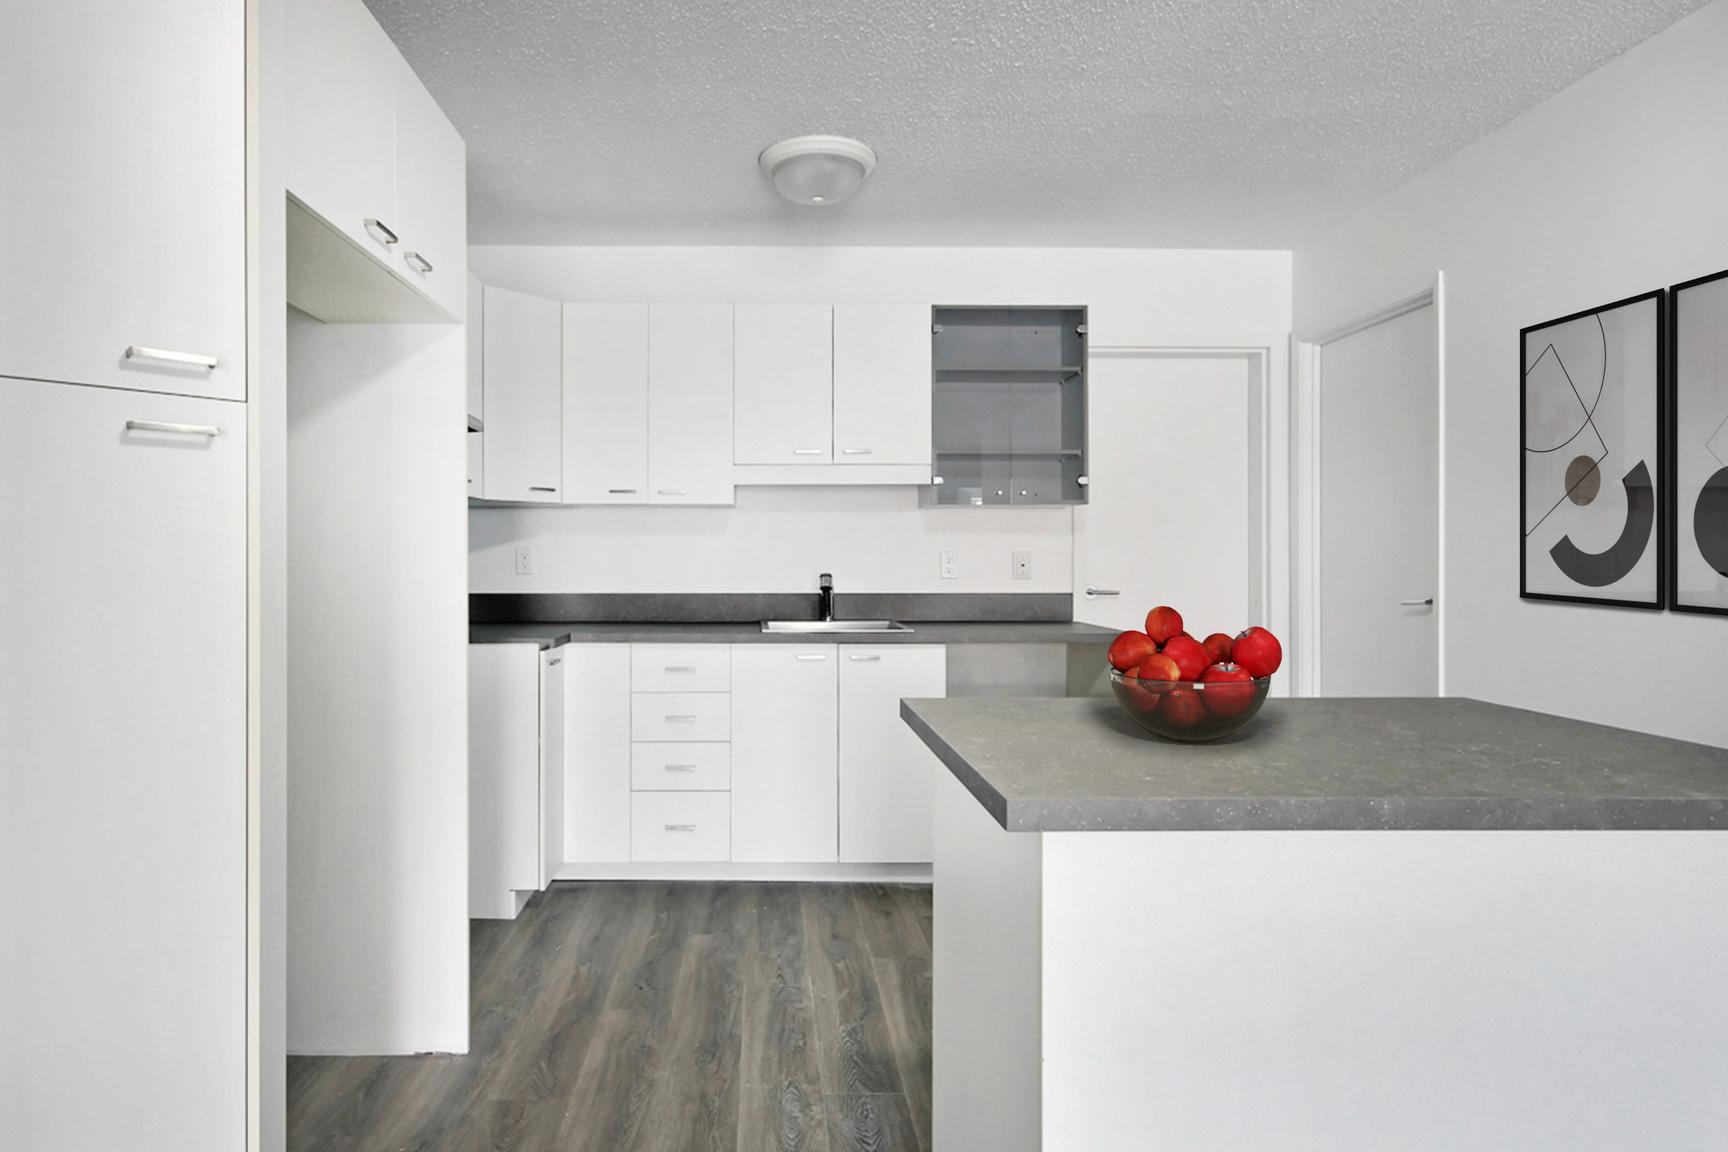 1 bedroom Apartments for rent in Quebec City at Les Appartements du Verdier - Photo 16 - RentQuebecApartments – L407122